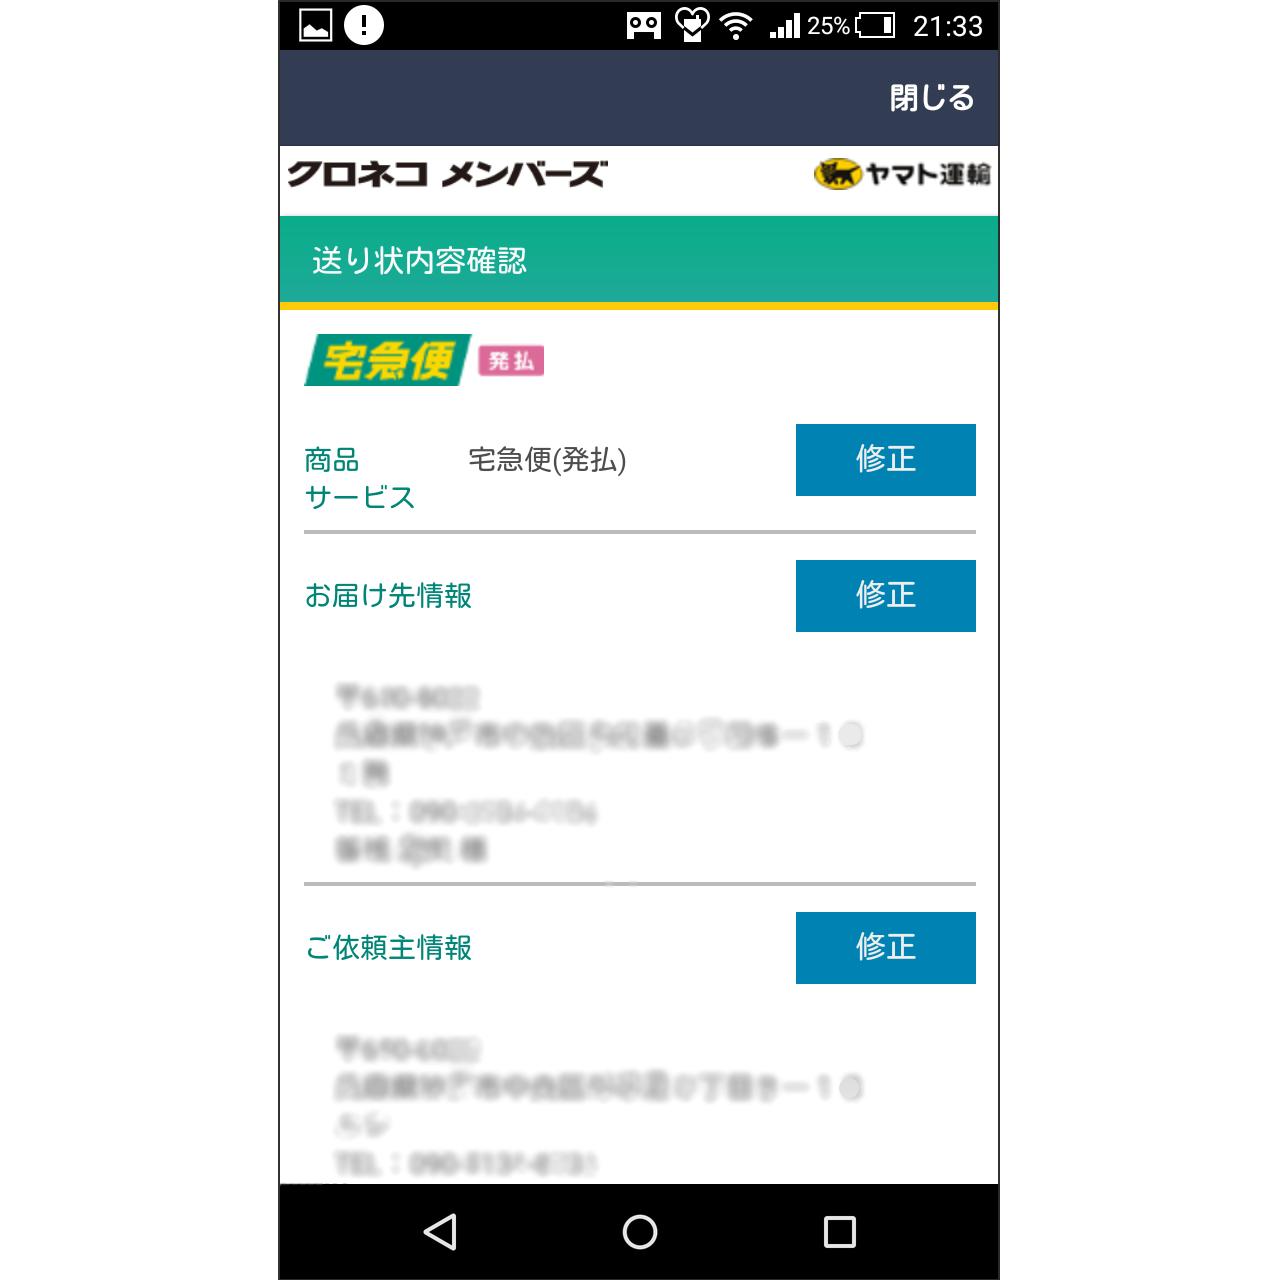 screenshot_2016-09-09-21-33-06